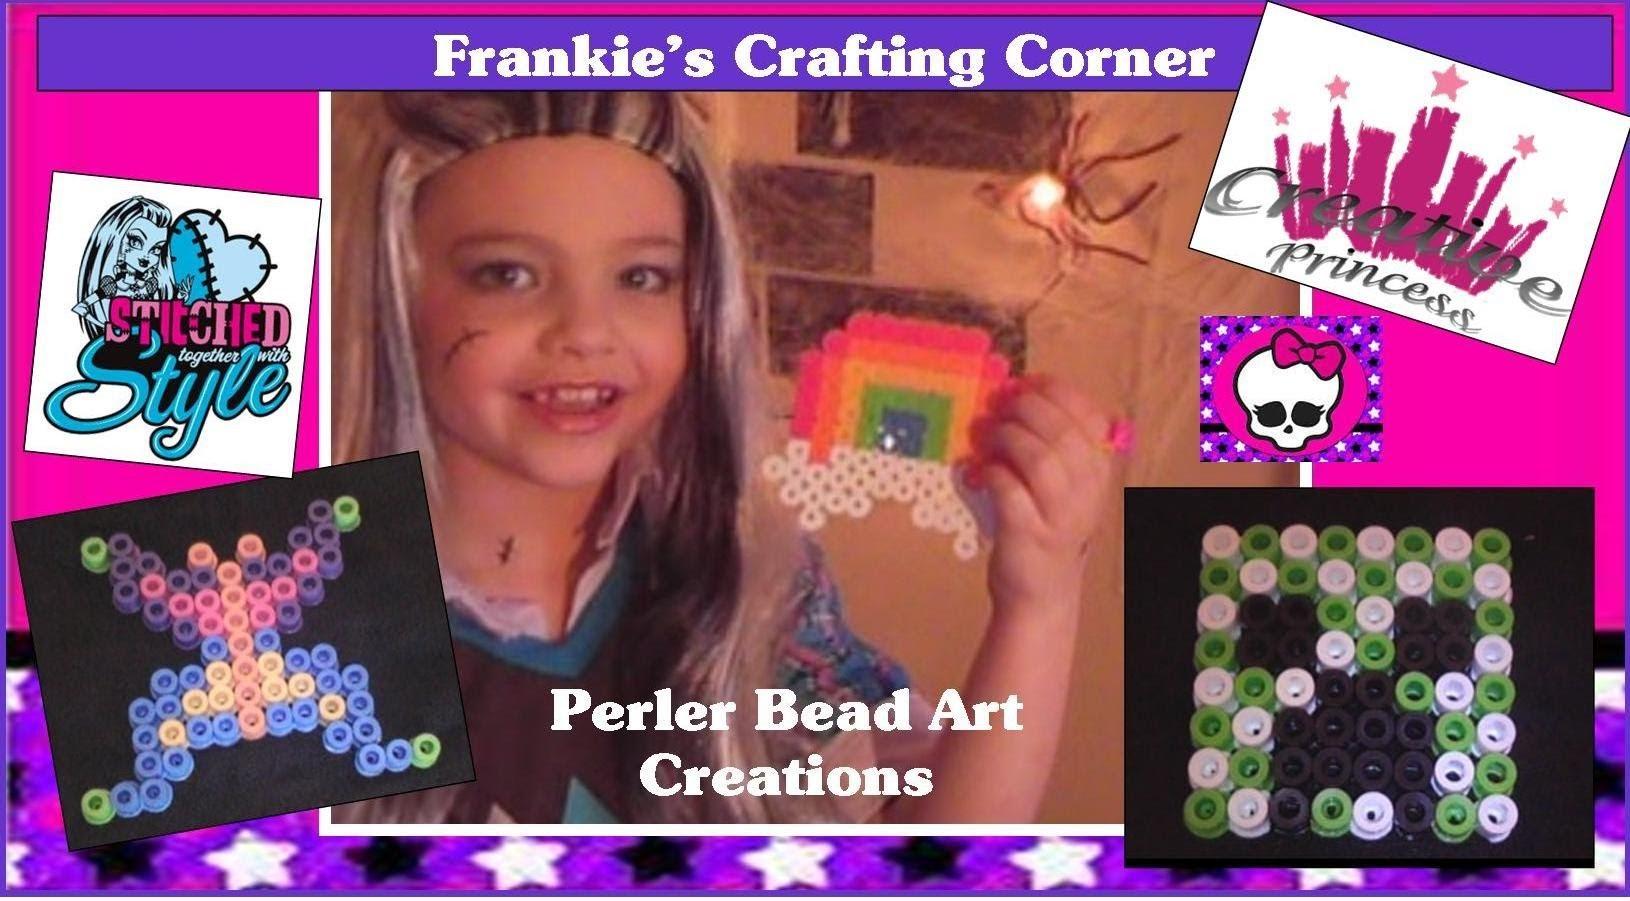 Monster High | Frankie's Crafting Corner - Perler Bead Art Creations | Creative Princess